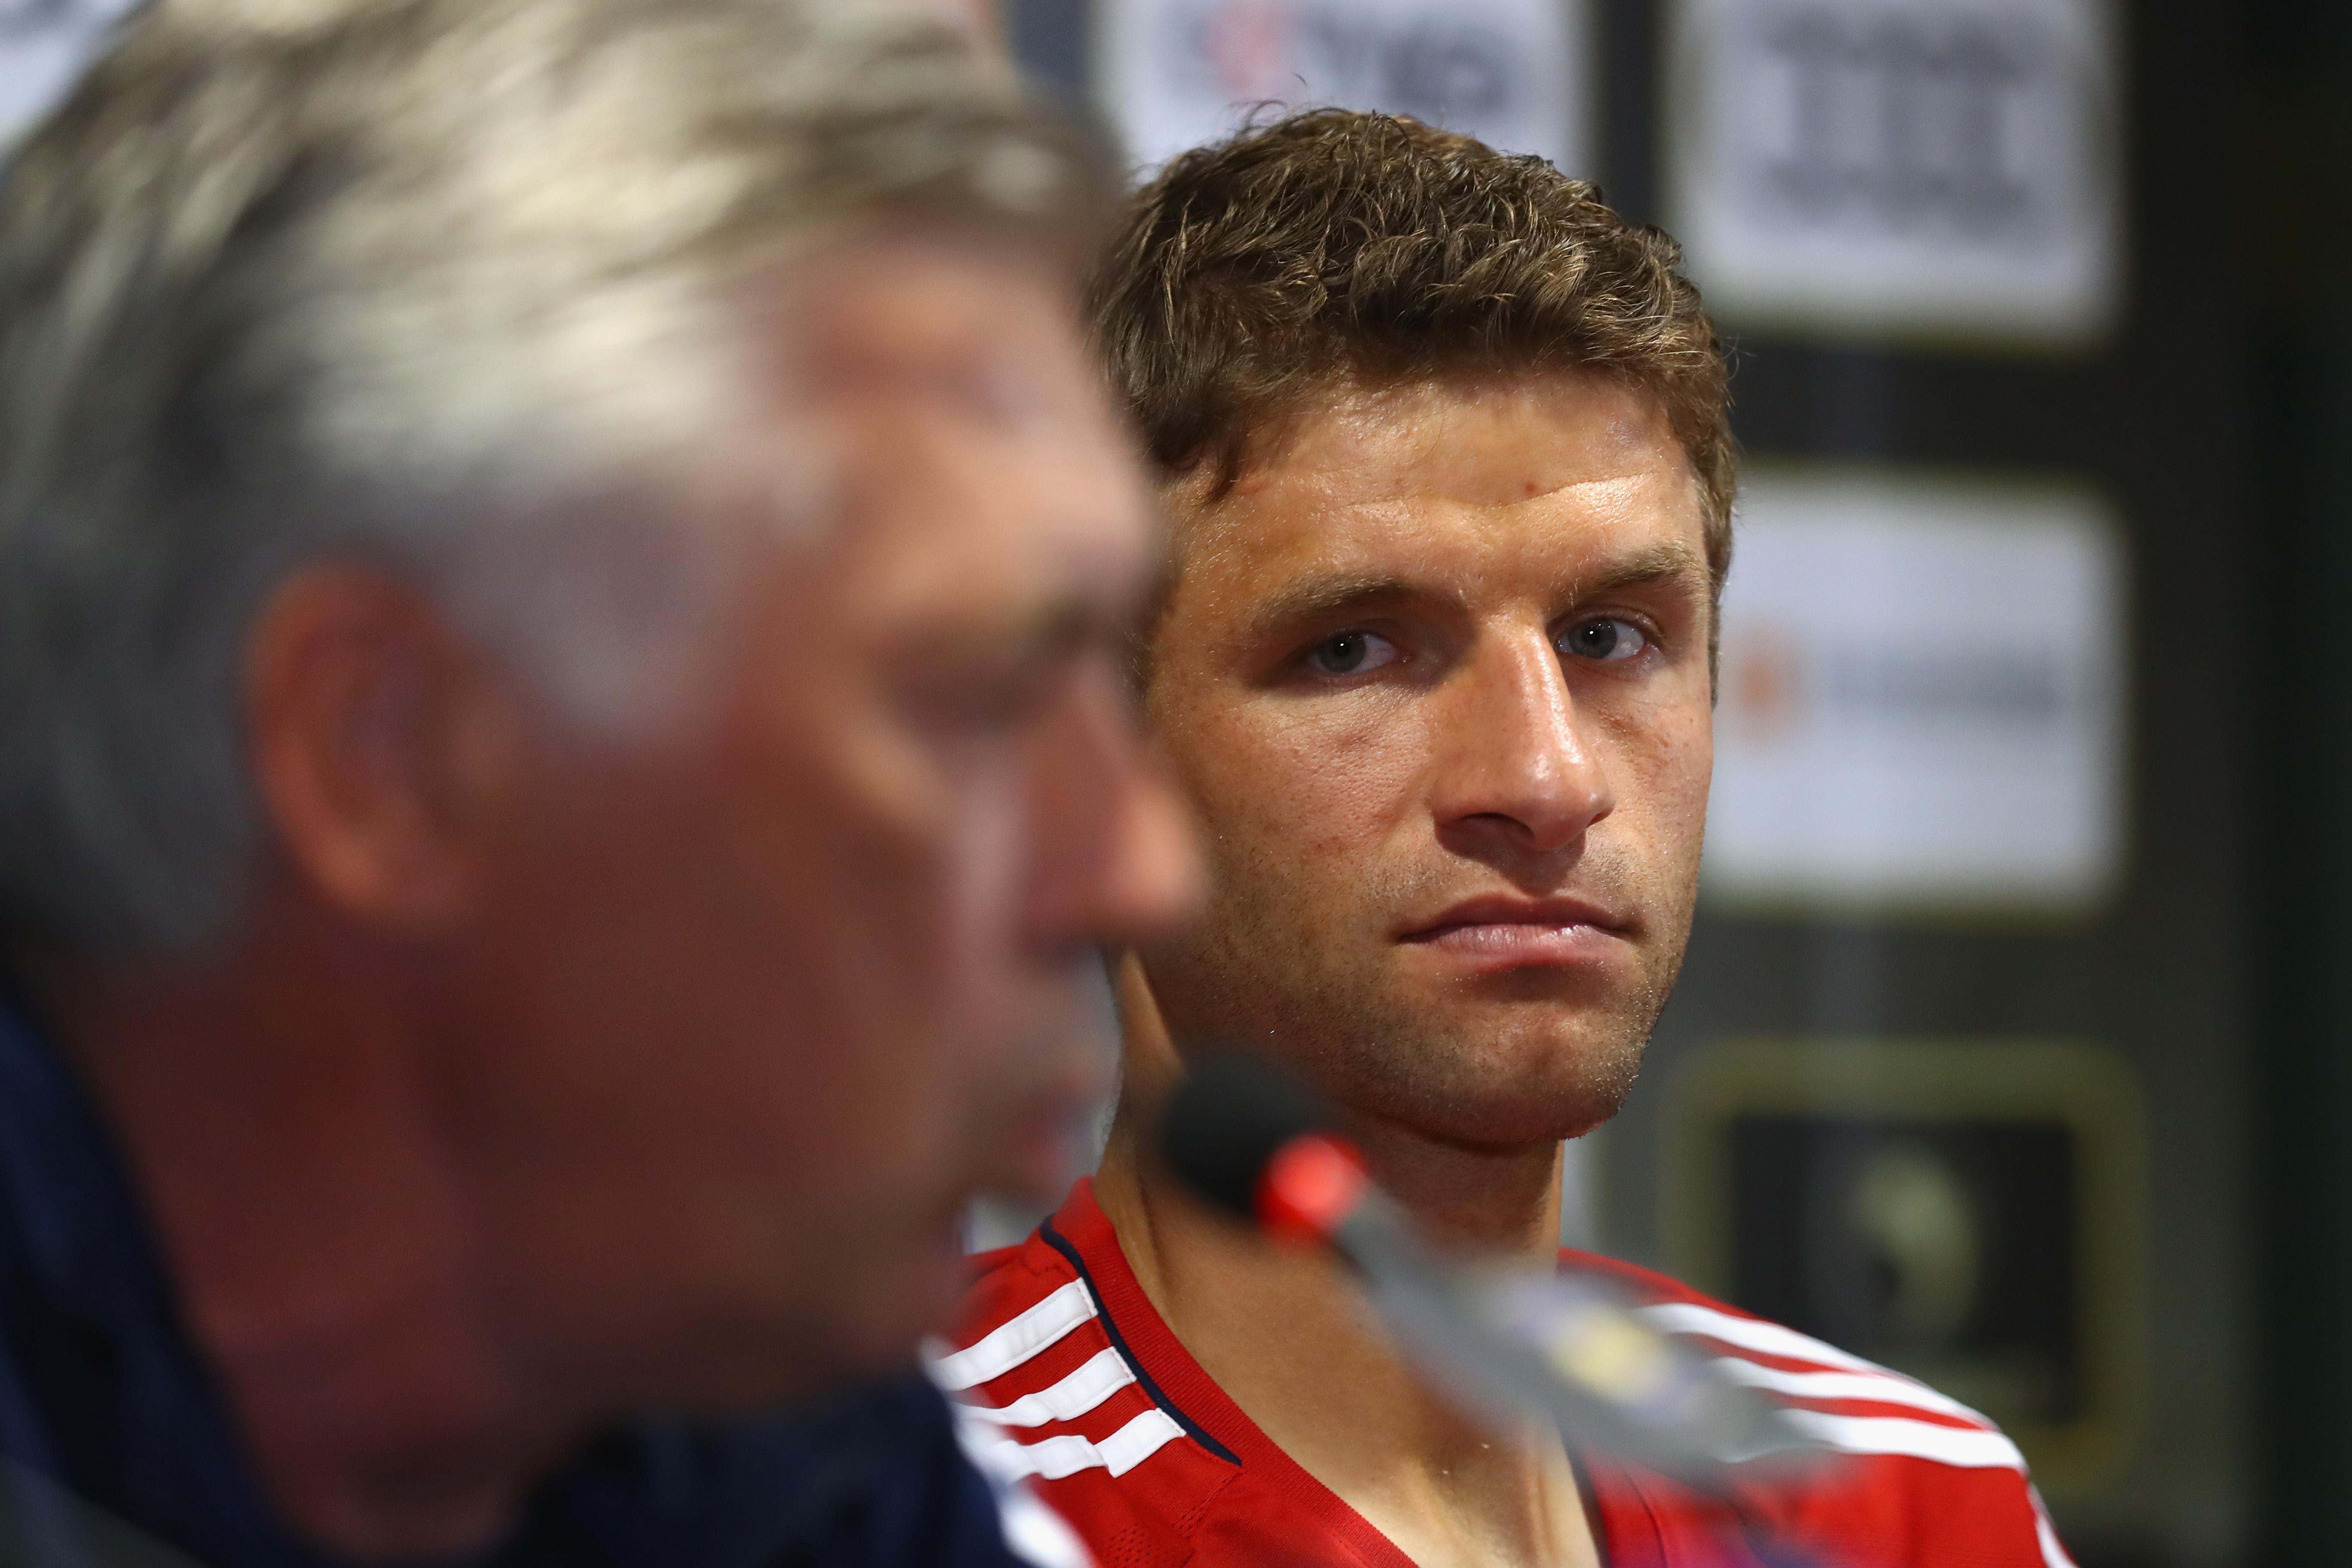 *NO GALLERY* Carlo Ancelotti Thomas Müller FC Bayern München